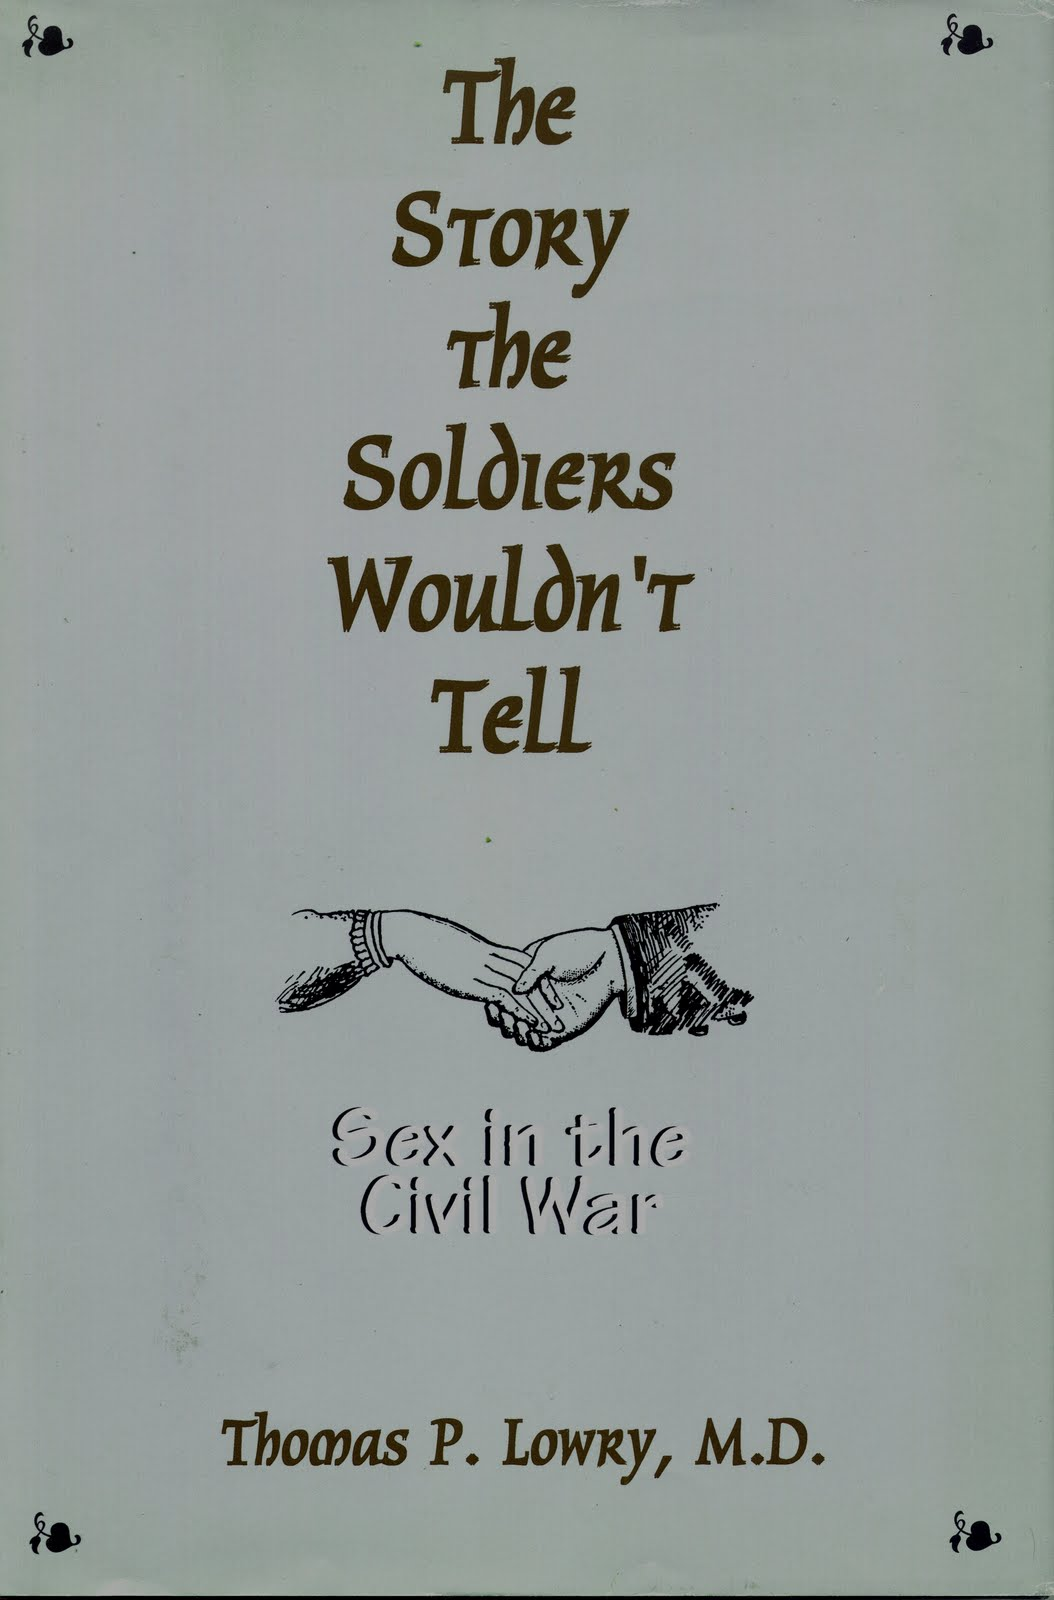 [civilwar1]